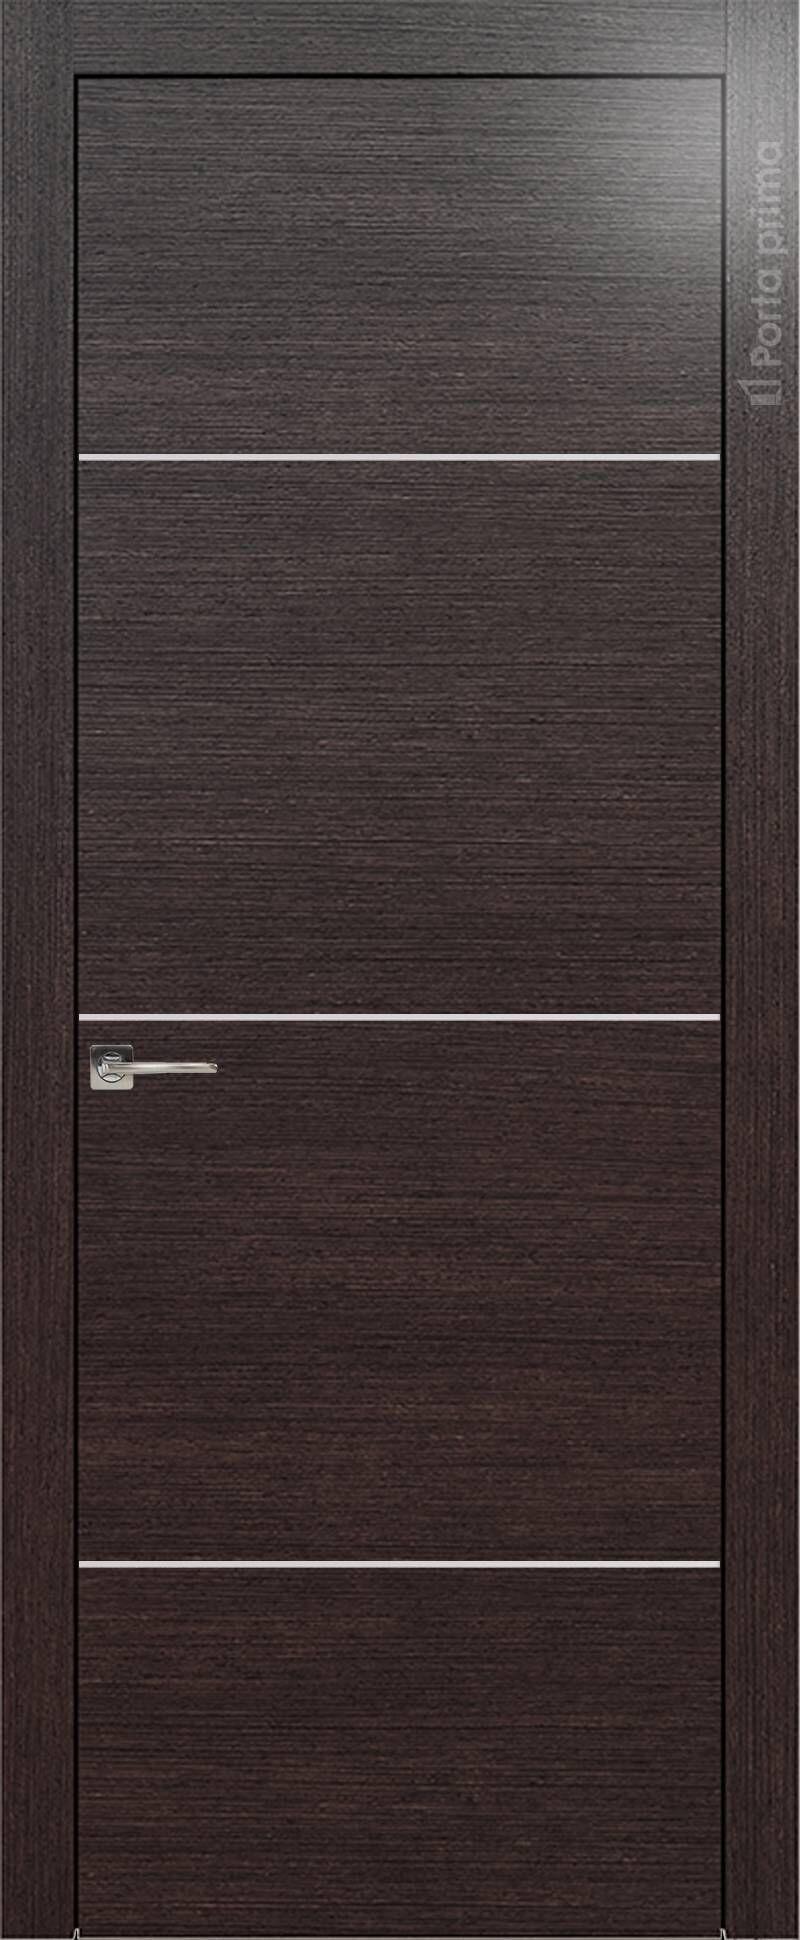 Tivoli Г-3 цвет - Венге Шоколад Без стекла (ДГ)